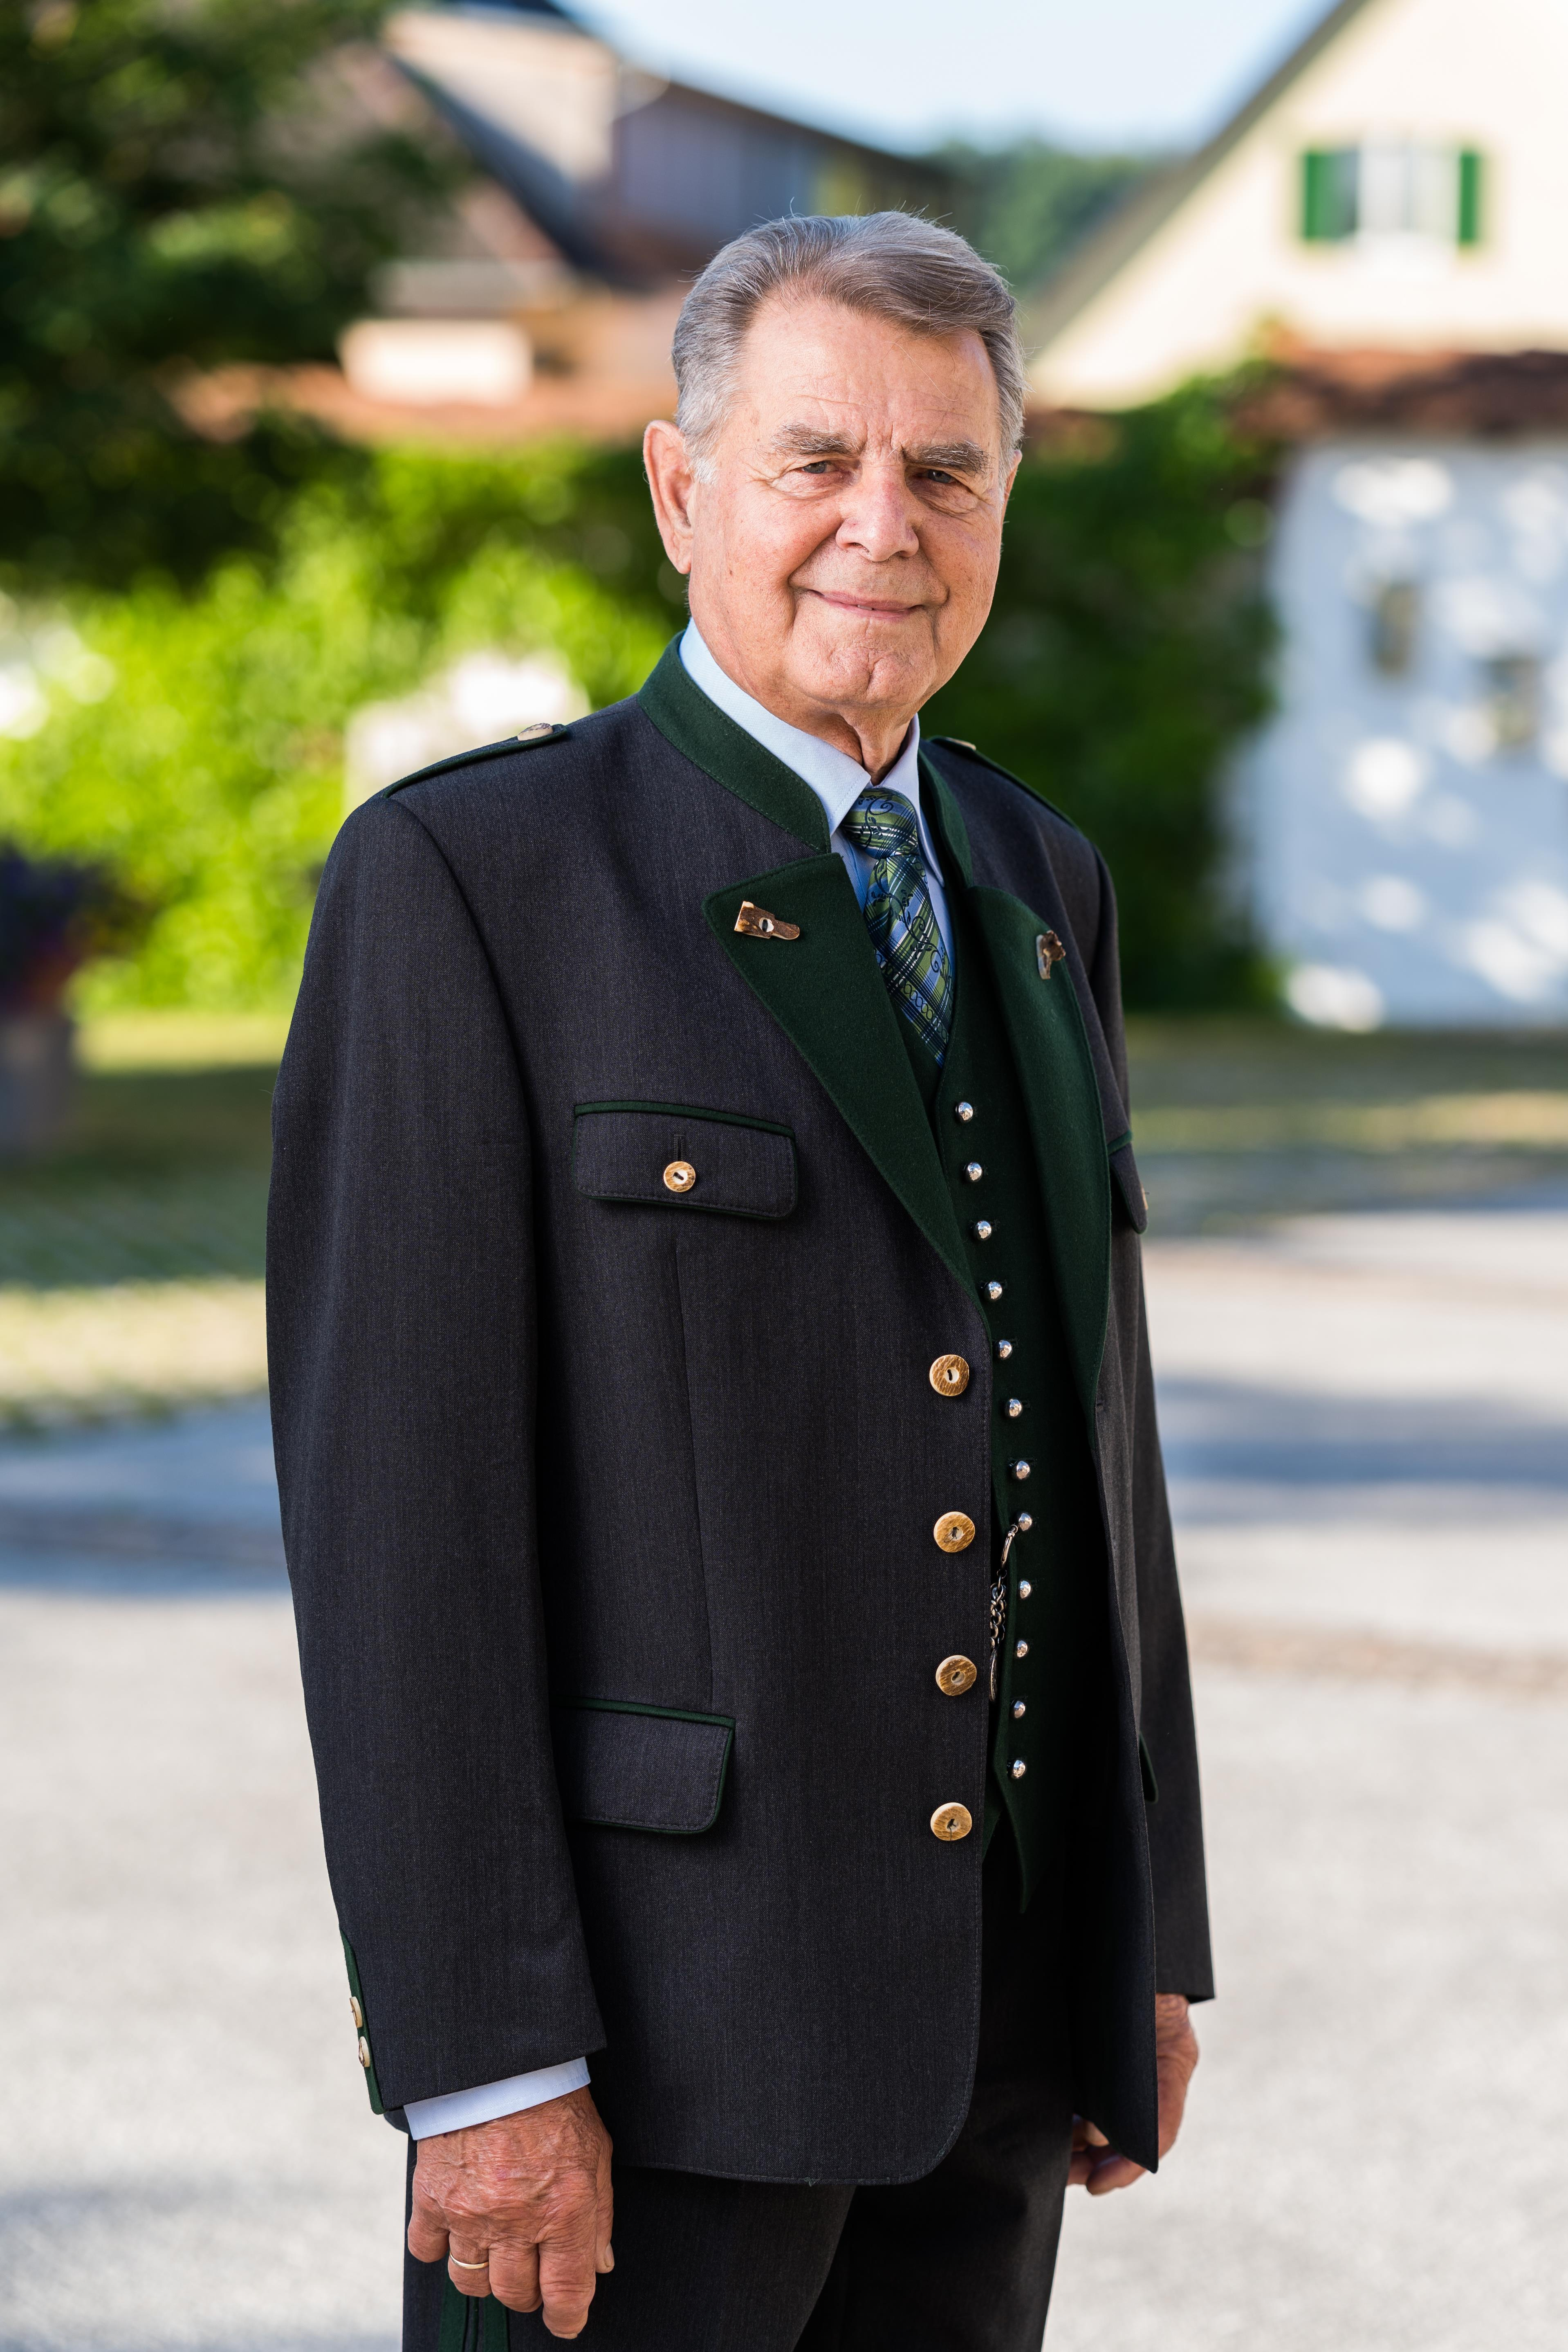 Ehrenkapellmeister Alfred Sailer sen. :